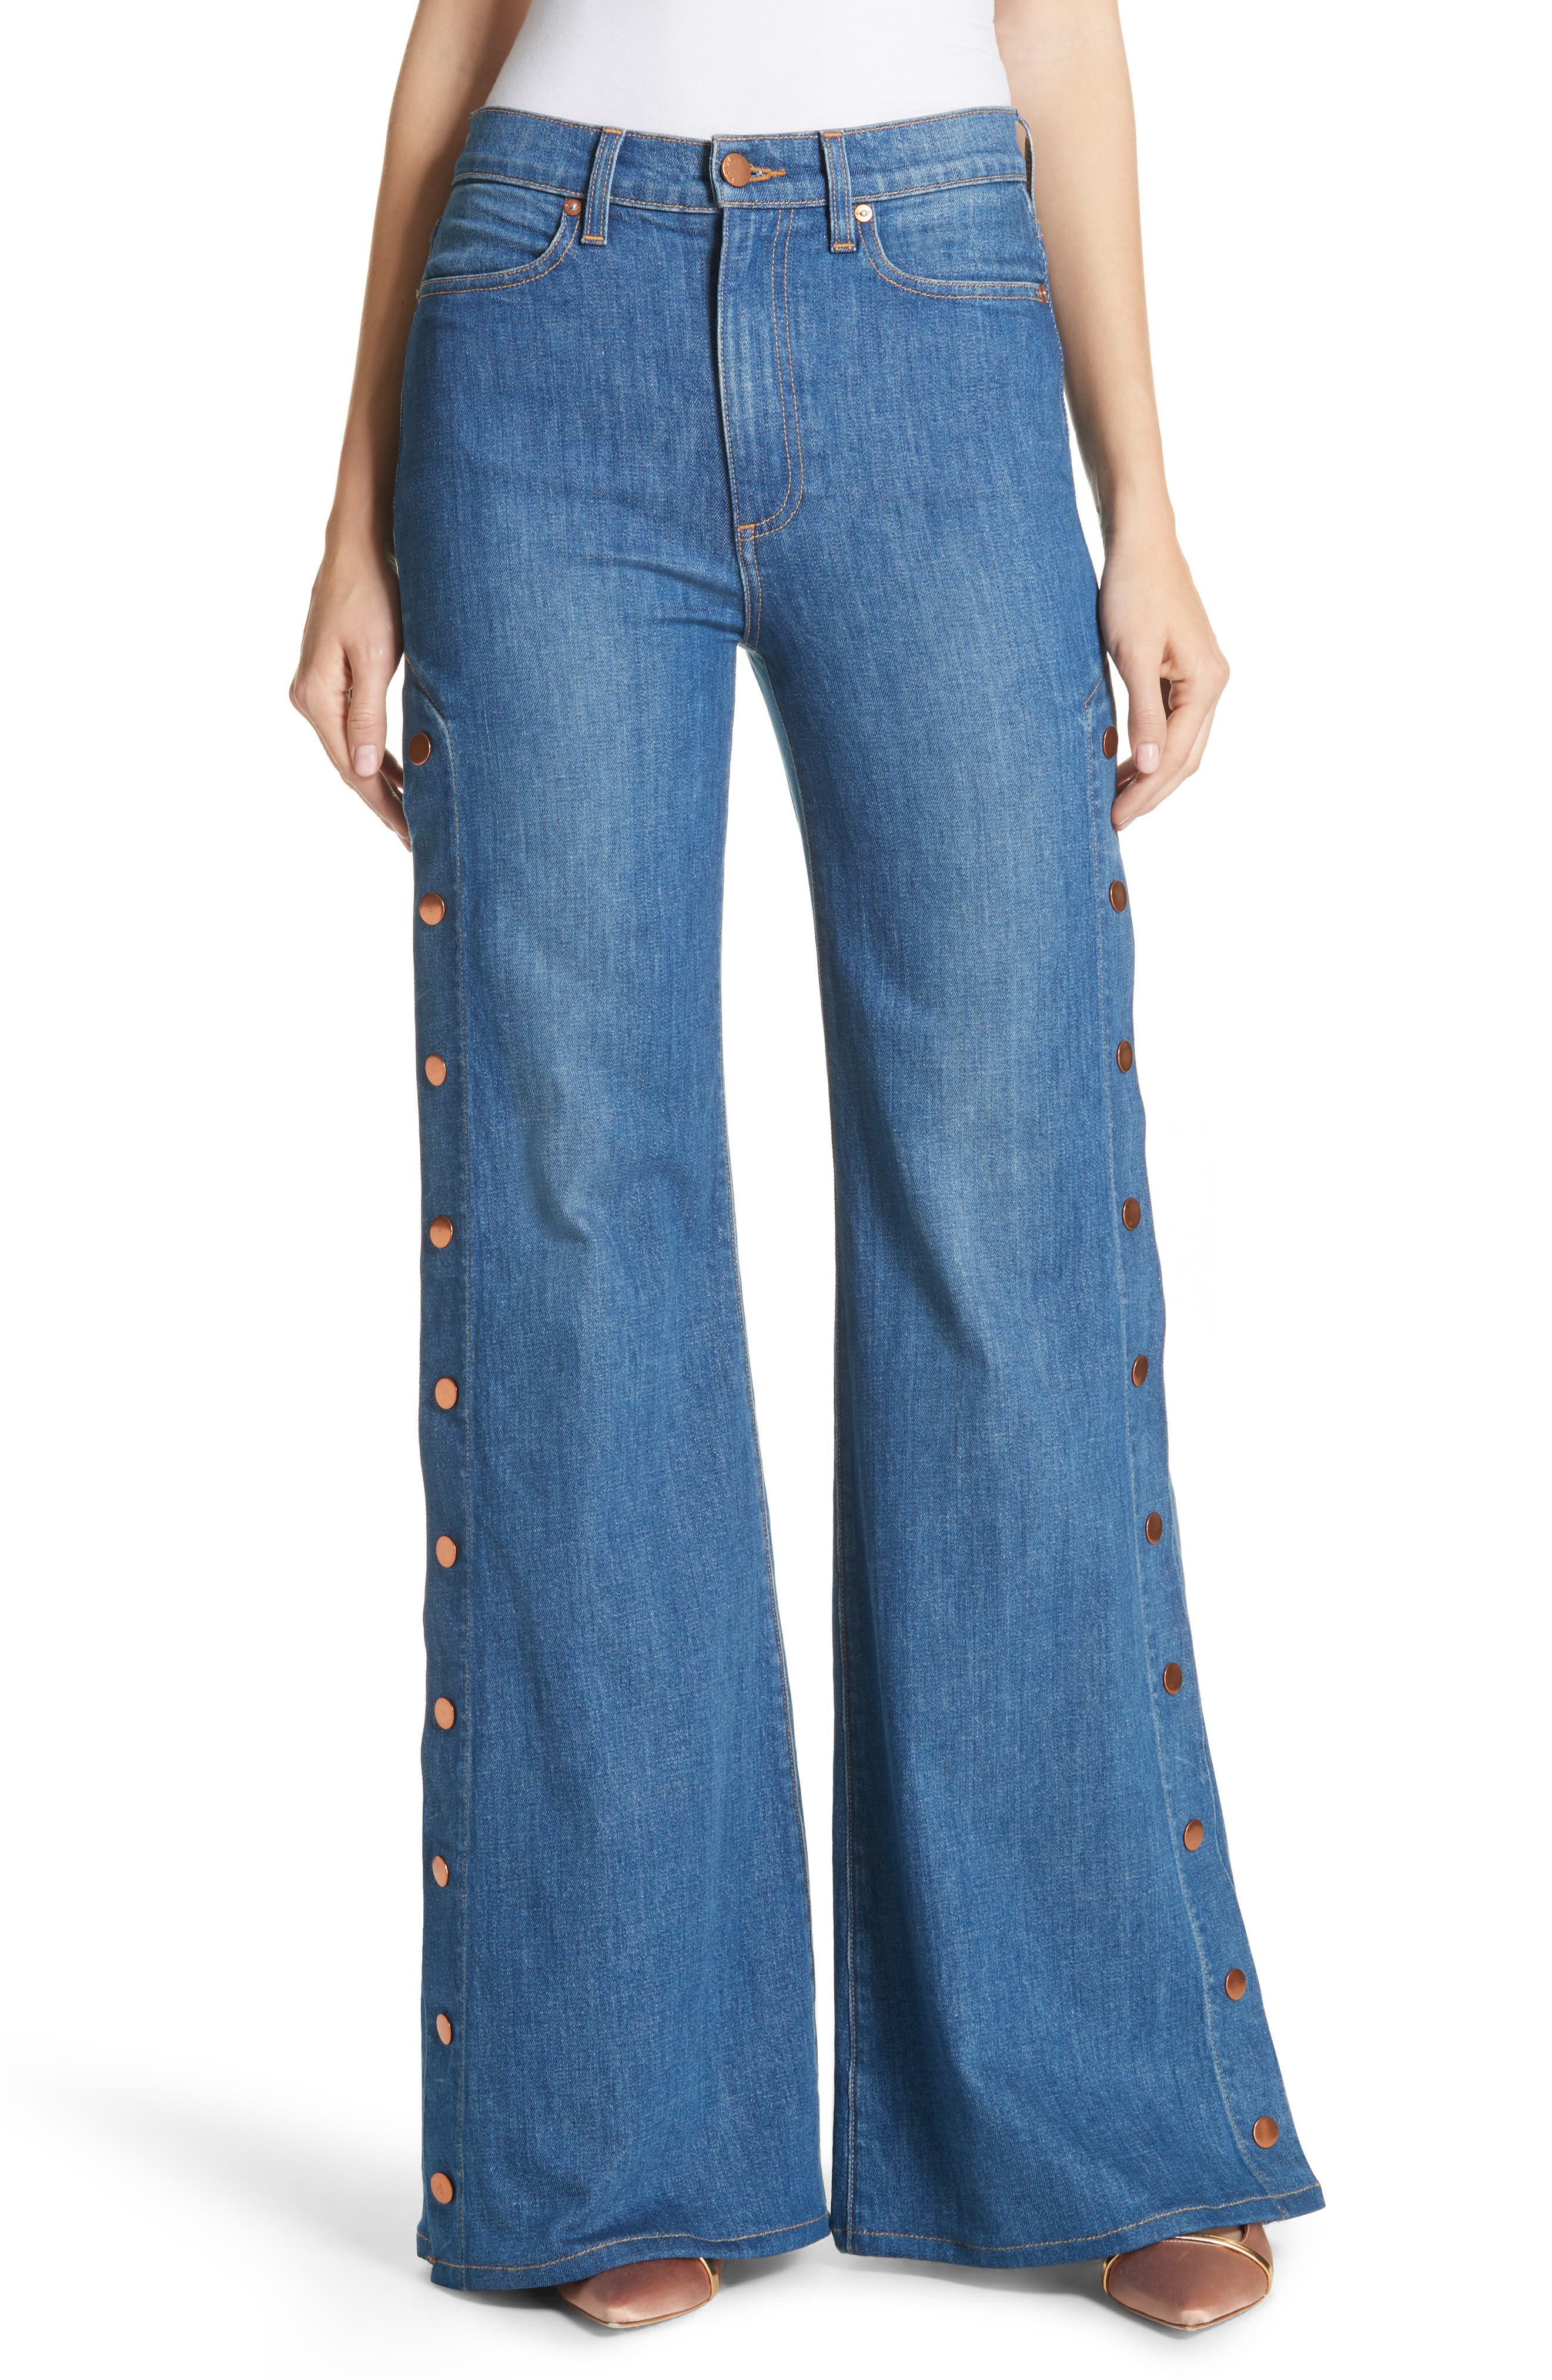 AO.LA Gorgeous Snap Side Flare Leg Jeans,                             Main thumbnail 1, color,                             French Blue